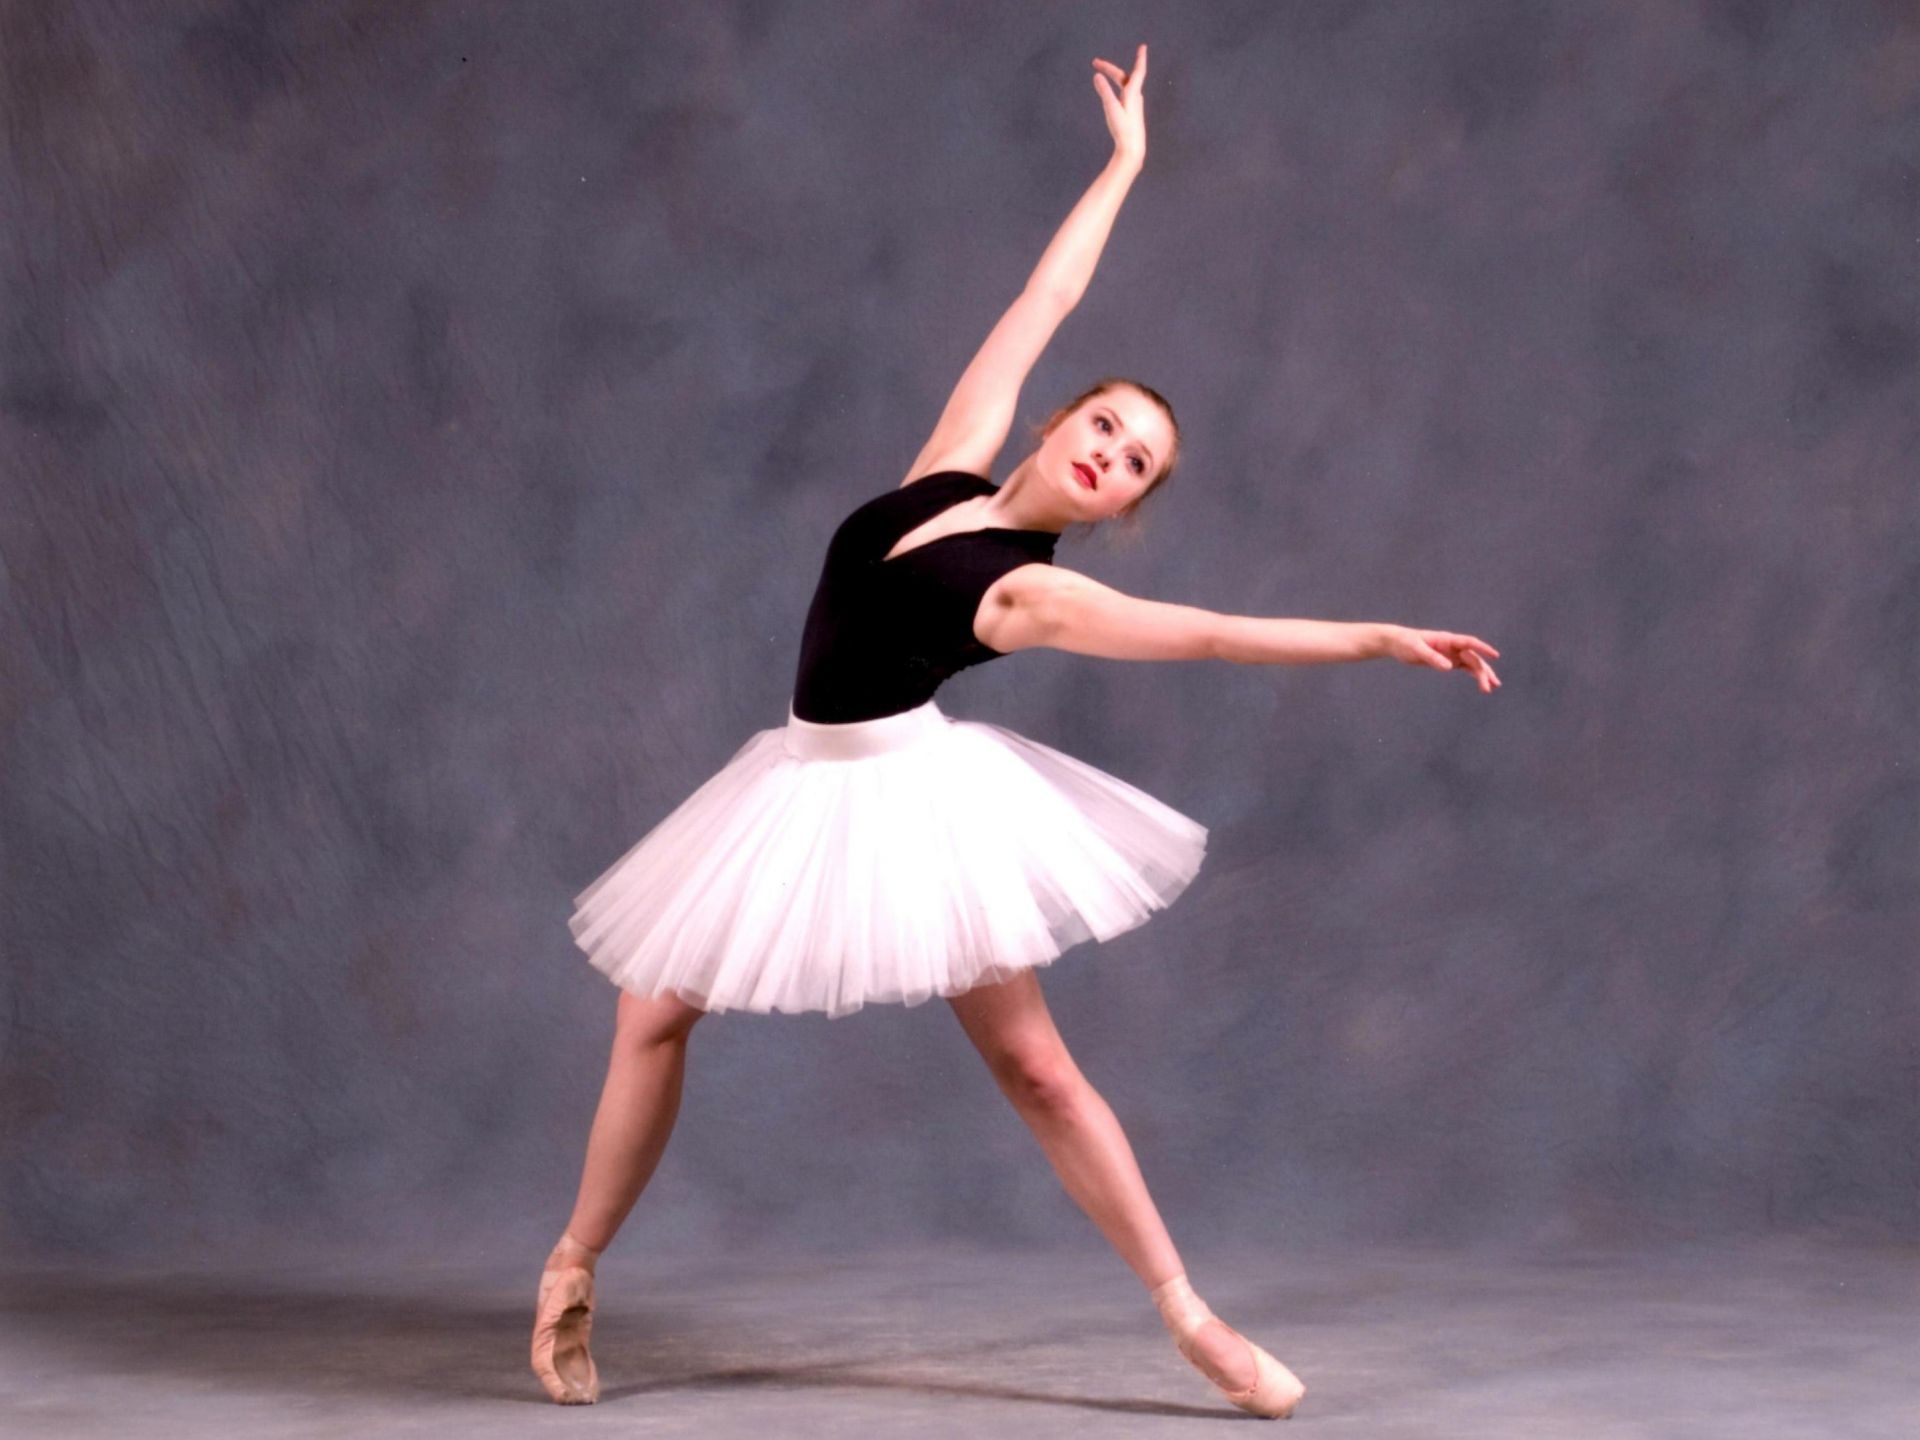 jana meerman ballet